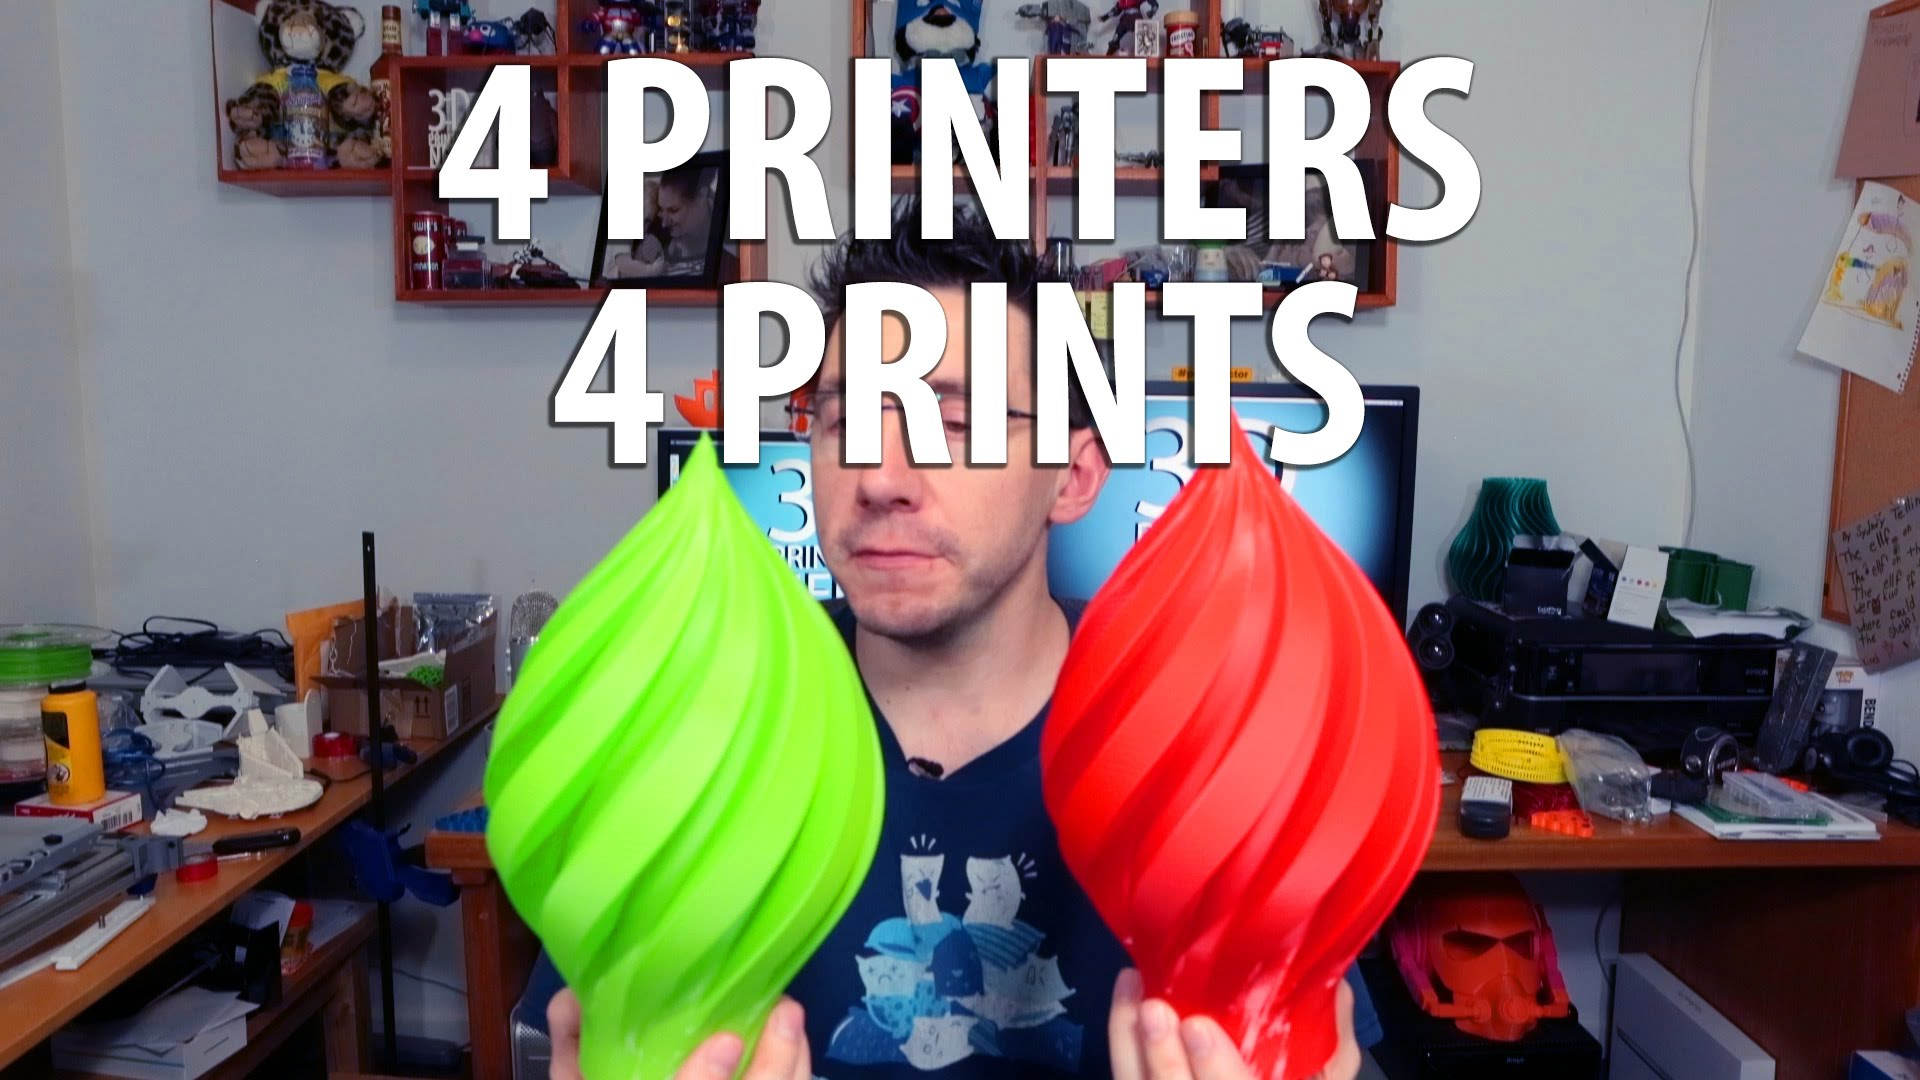 3D Printing: 4 3D Printers 4 3D Prints